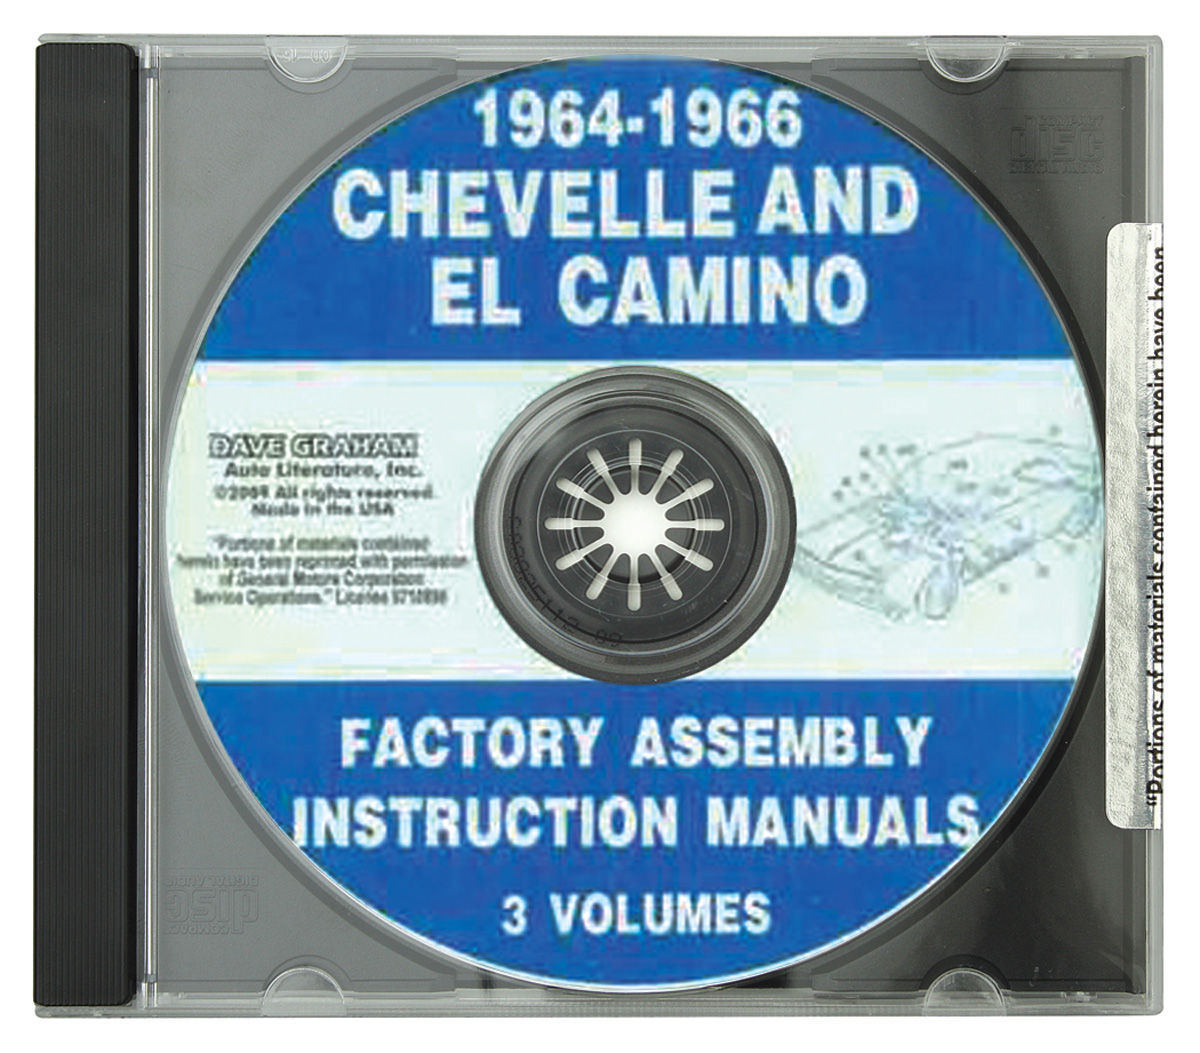 Assembly Manual, CD-ROM, 1964-66 Chevelle/El Camino